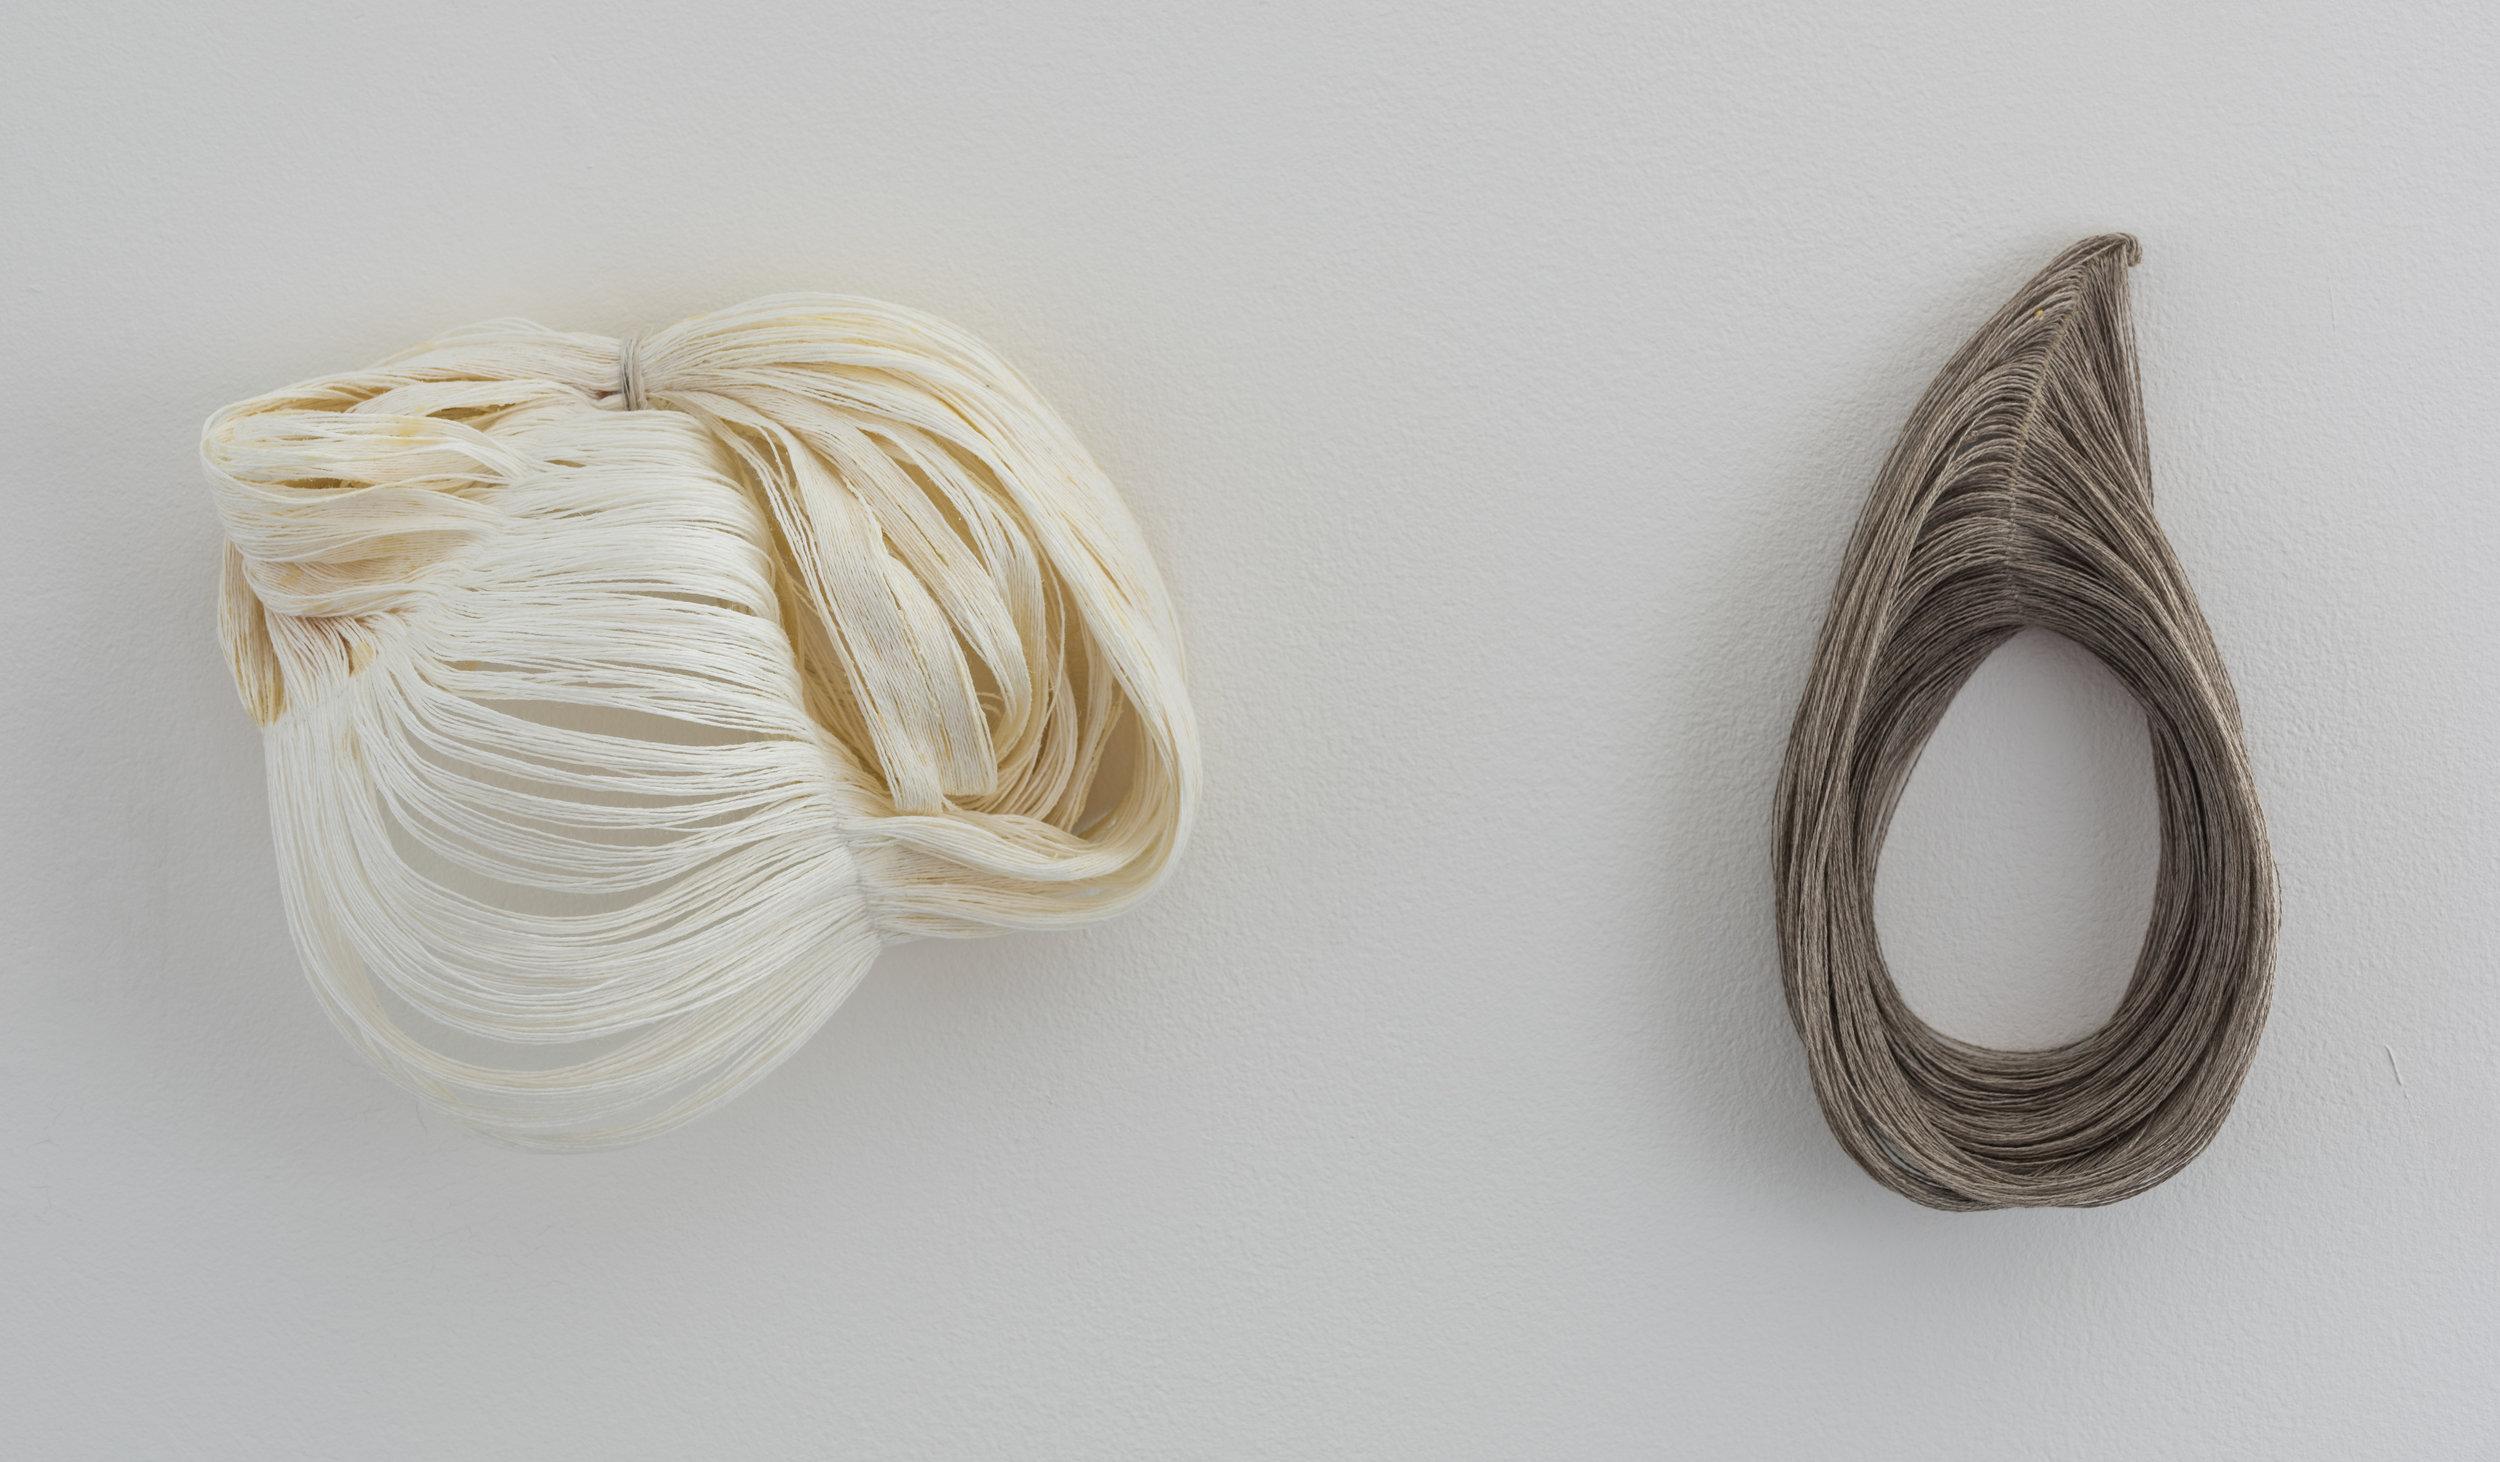 linen thread sculptures [beeswax, wire]